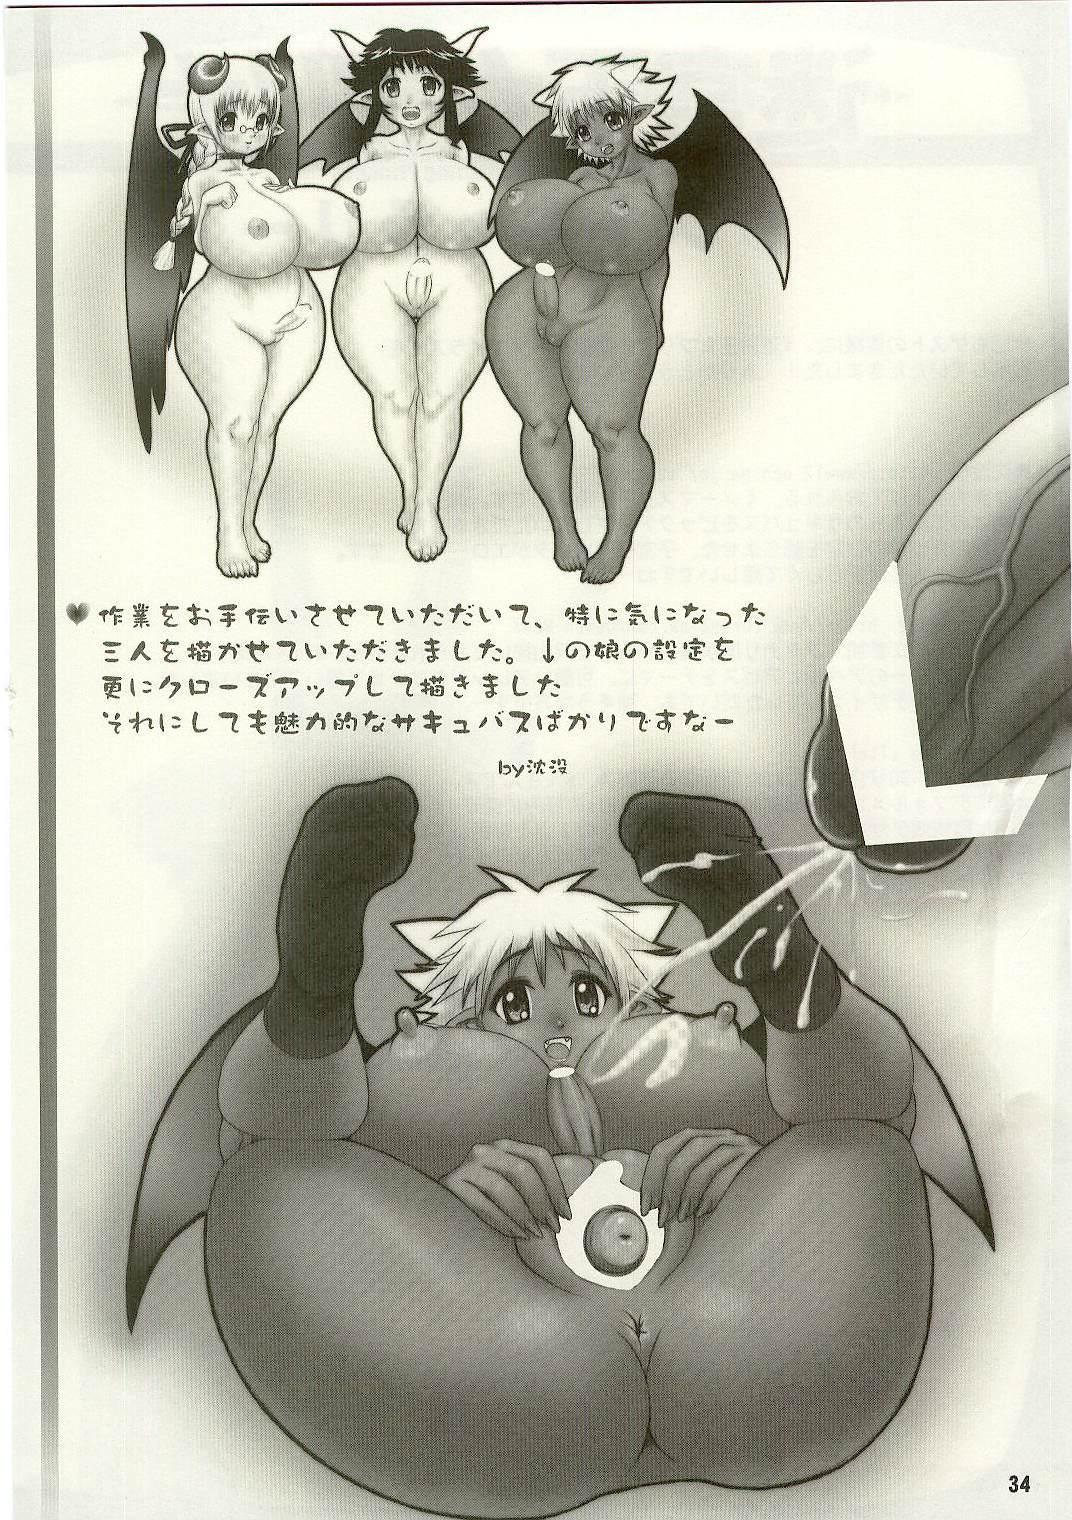 TGWOA Vol.17 - Meikyuu Oujo Prina 3 30